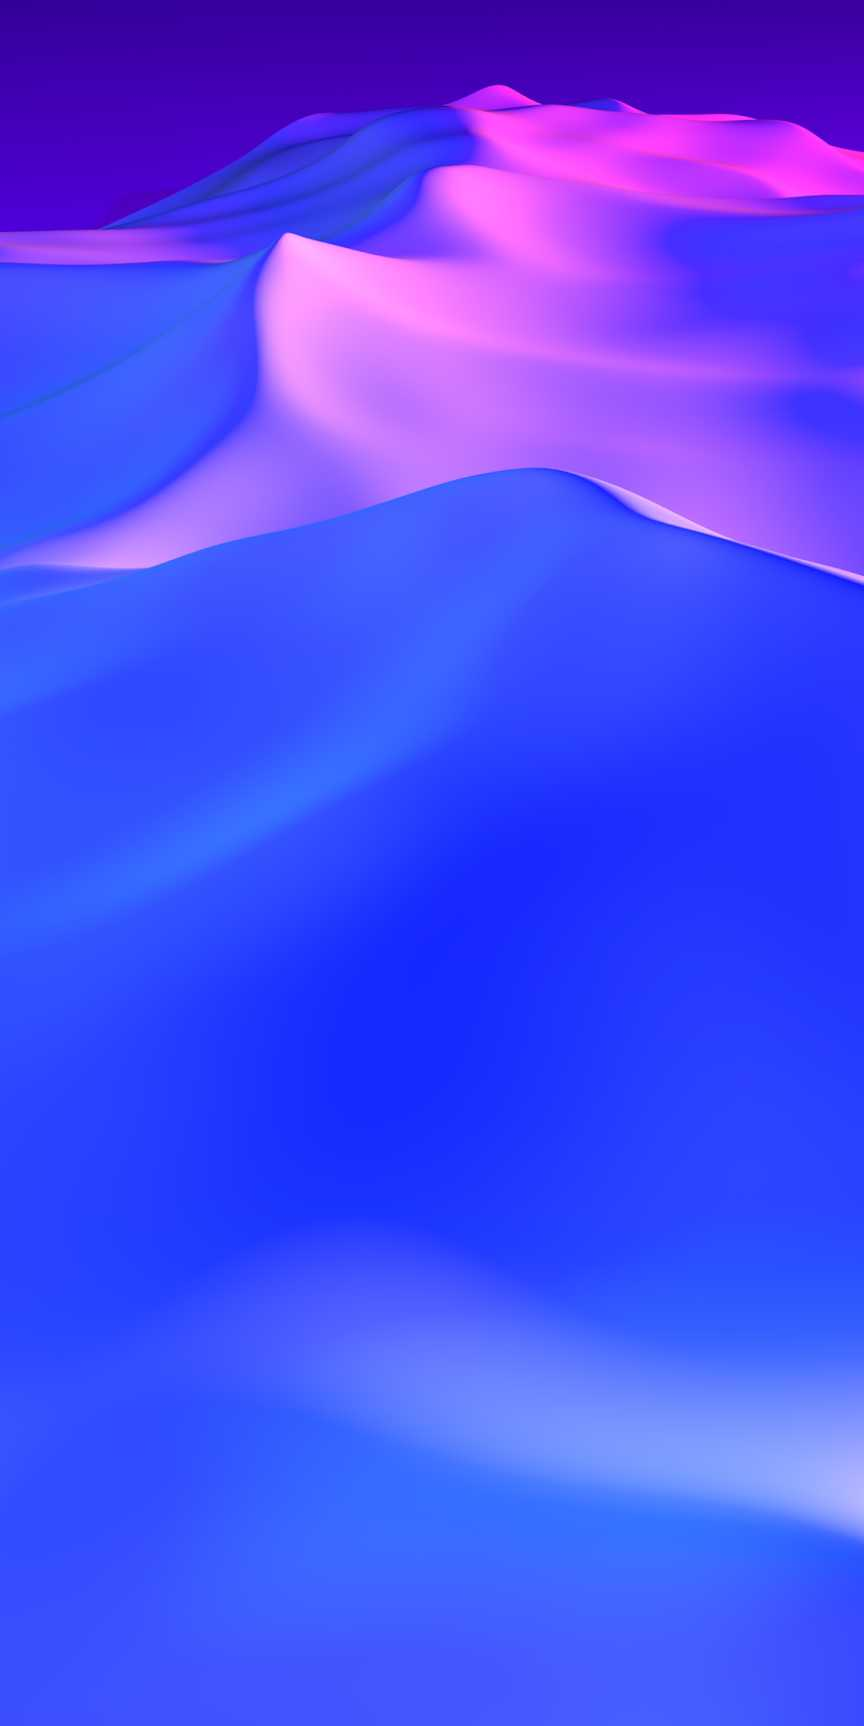 iPhone X Full HD Wallpapers - Wallpaper